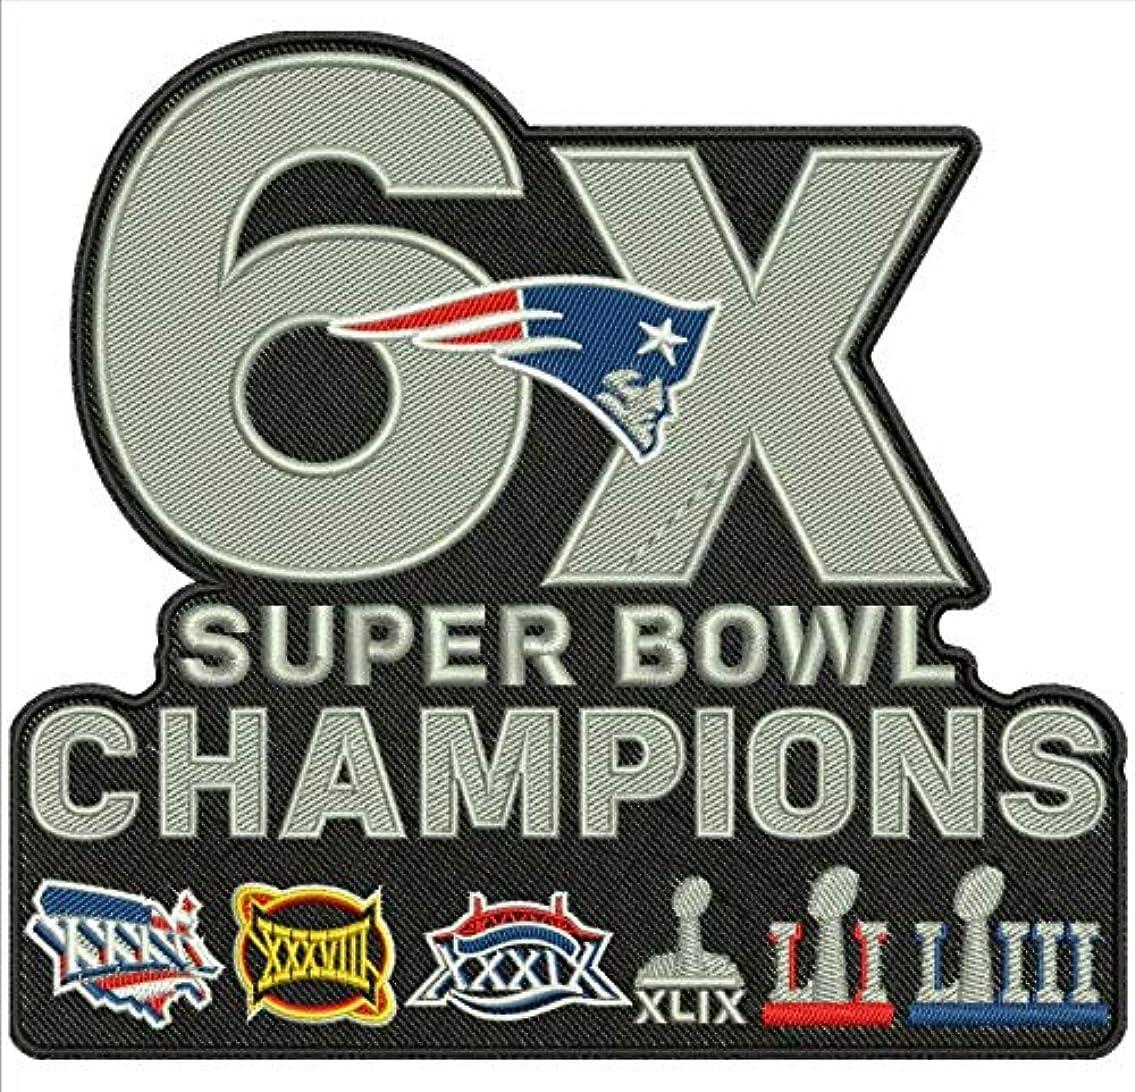 Football 2019 Super Bowl 53 LIII Patriots 6X Champs PATCHPRE Order Item - 出荷開始 2月18日